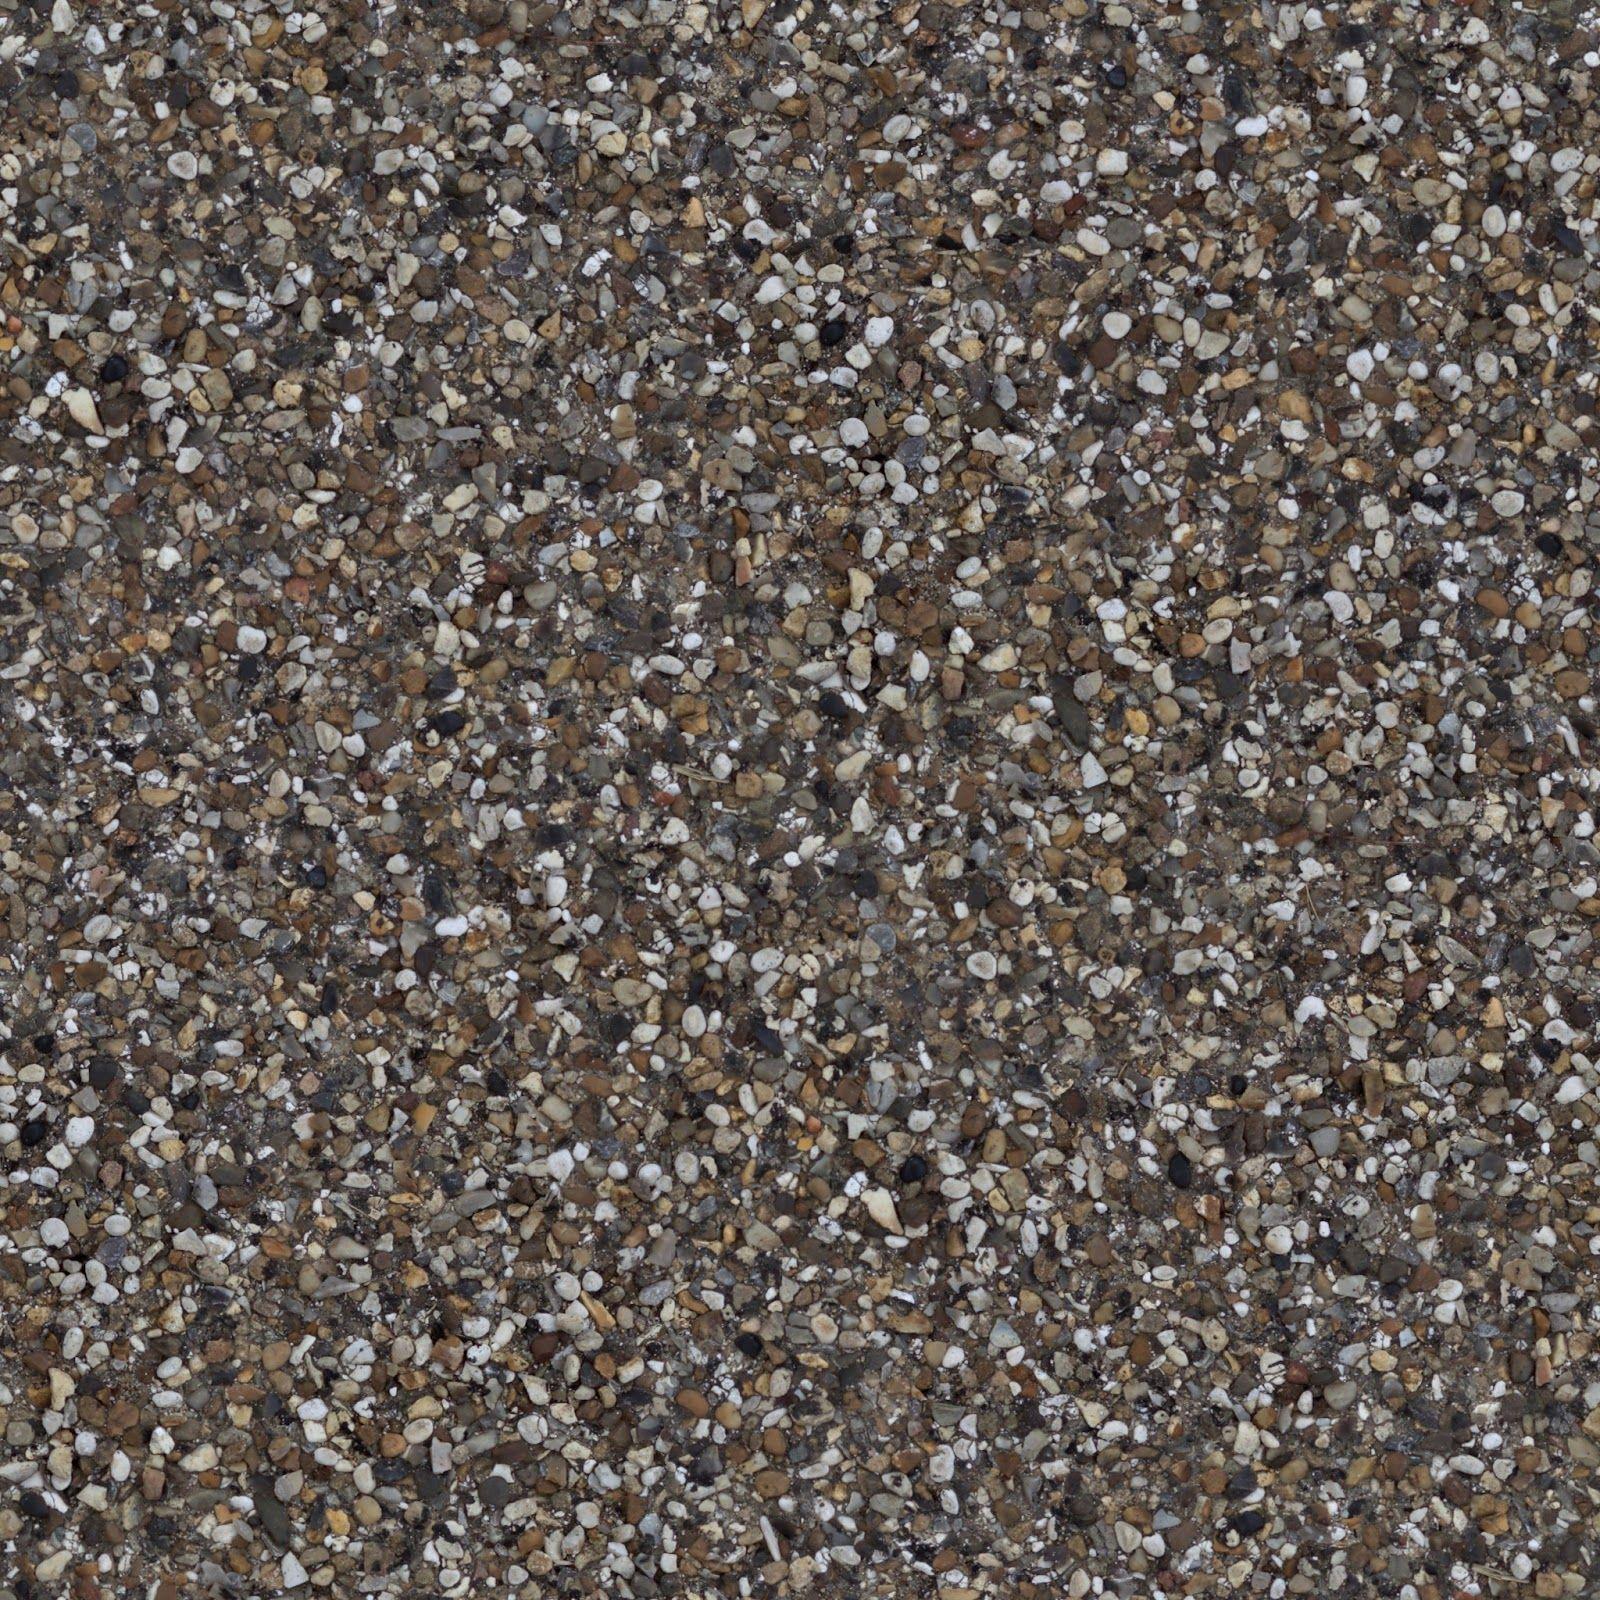 Pebblestone Cobble Ground Gravel Floor Walkway Seamless